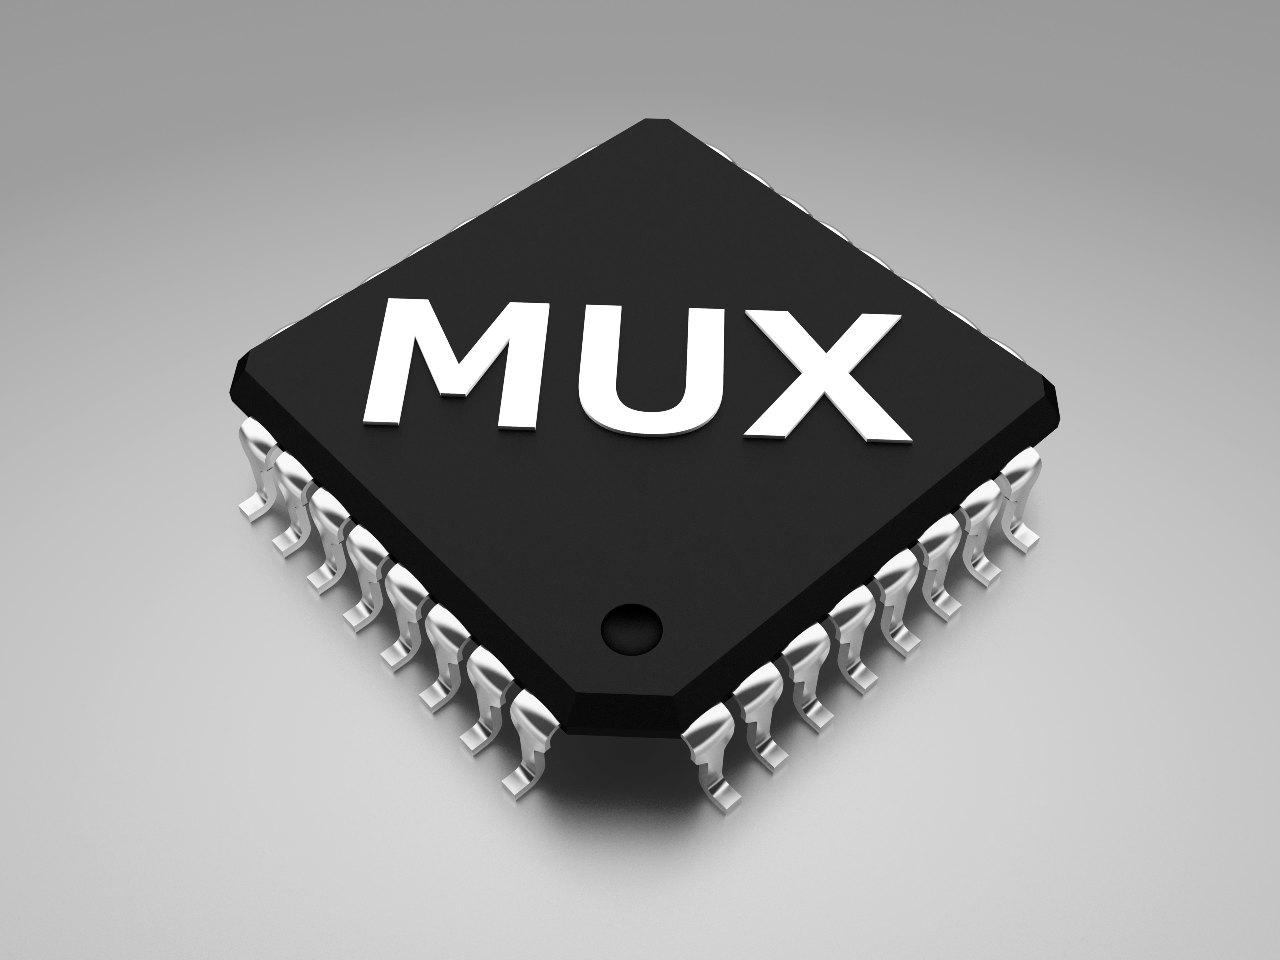 Mux (Adobe Stock)